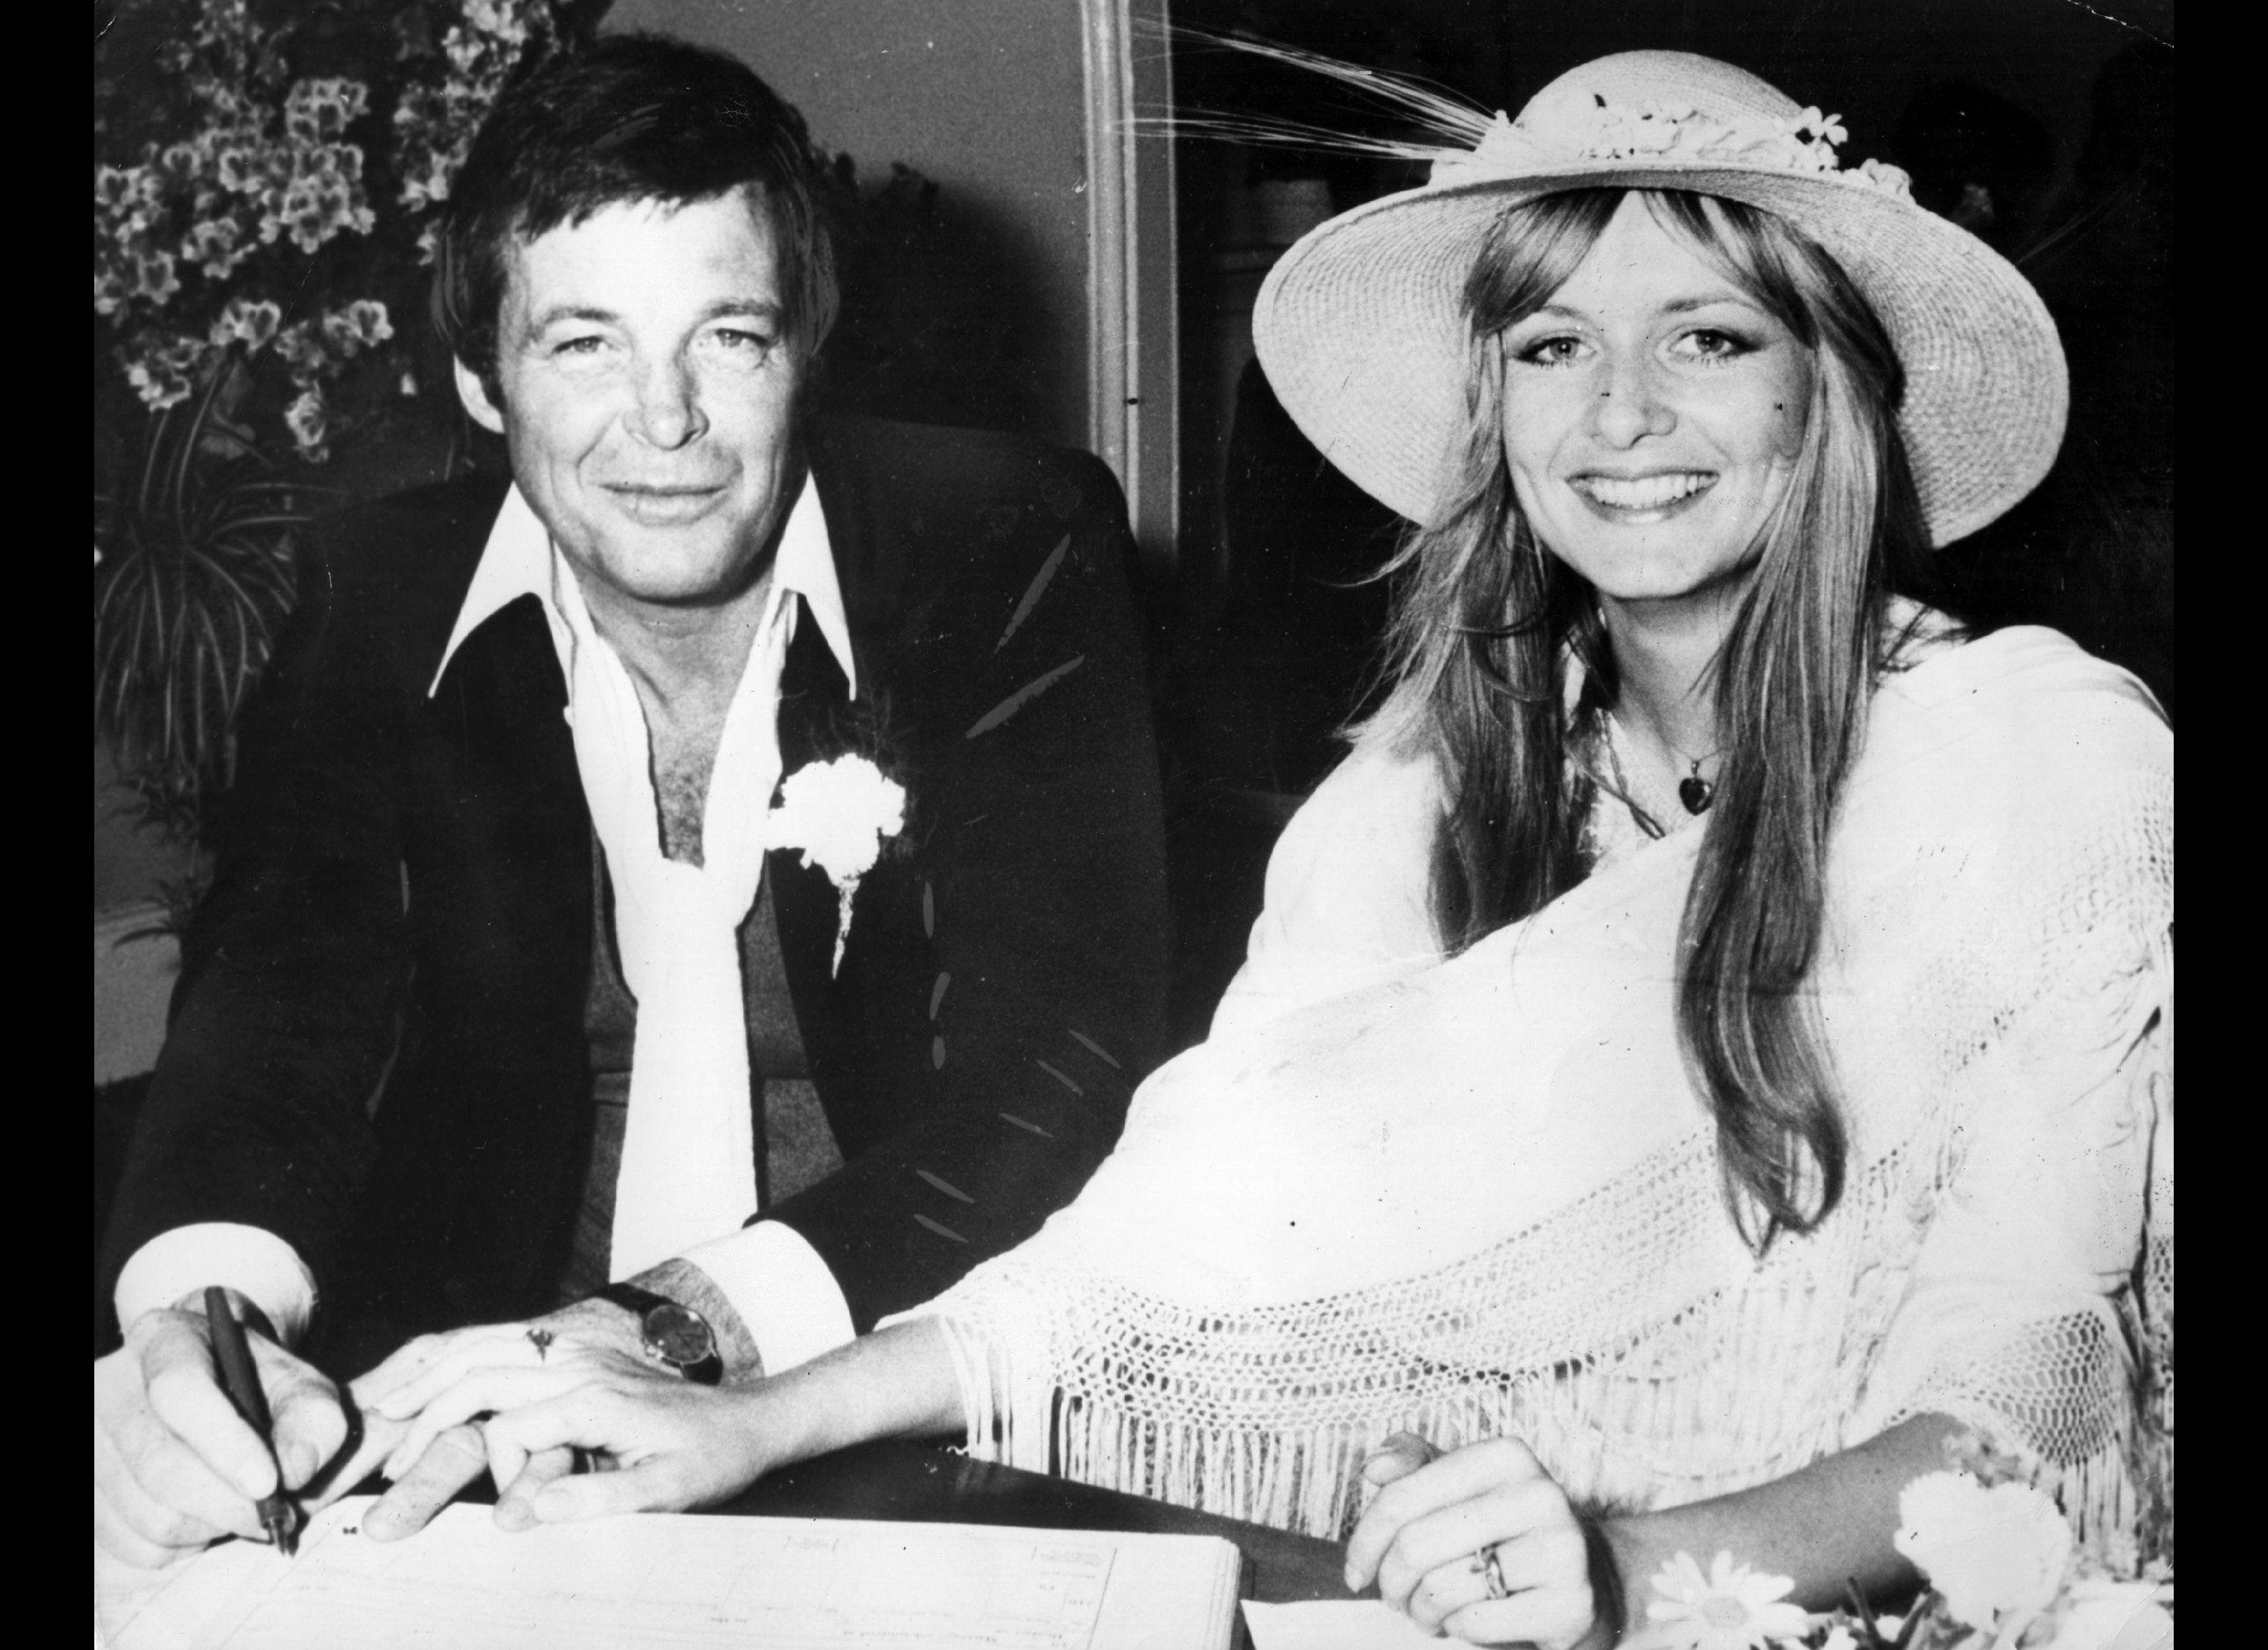 Henry winkler divorced - Henry Winkler And Bride 1978 Twiggy And Actor Michael Witney Wedding 1977